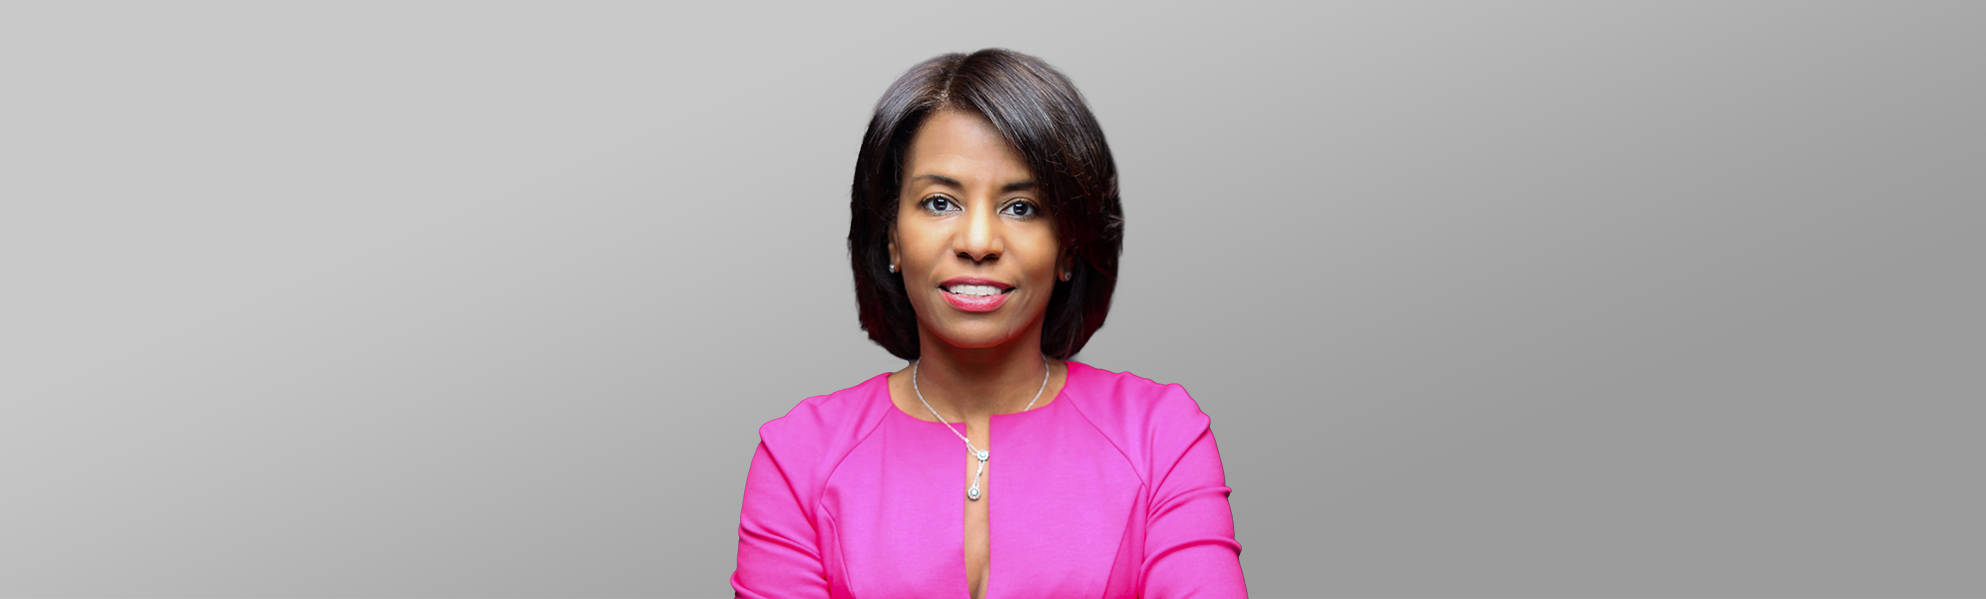 Photo of Deborah H.Telman, General Counsel and Head of Corporate Governance